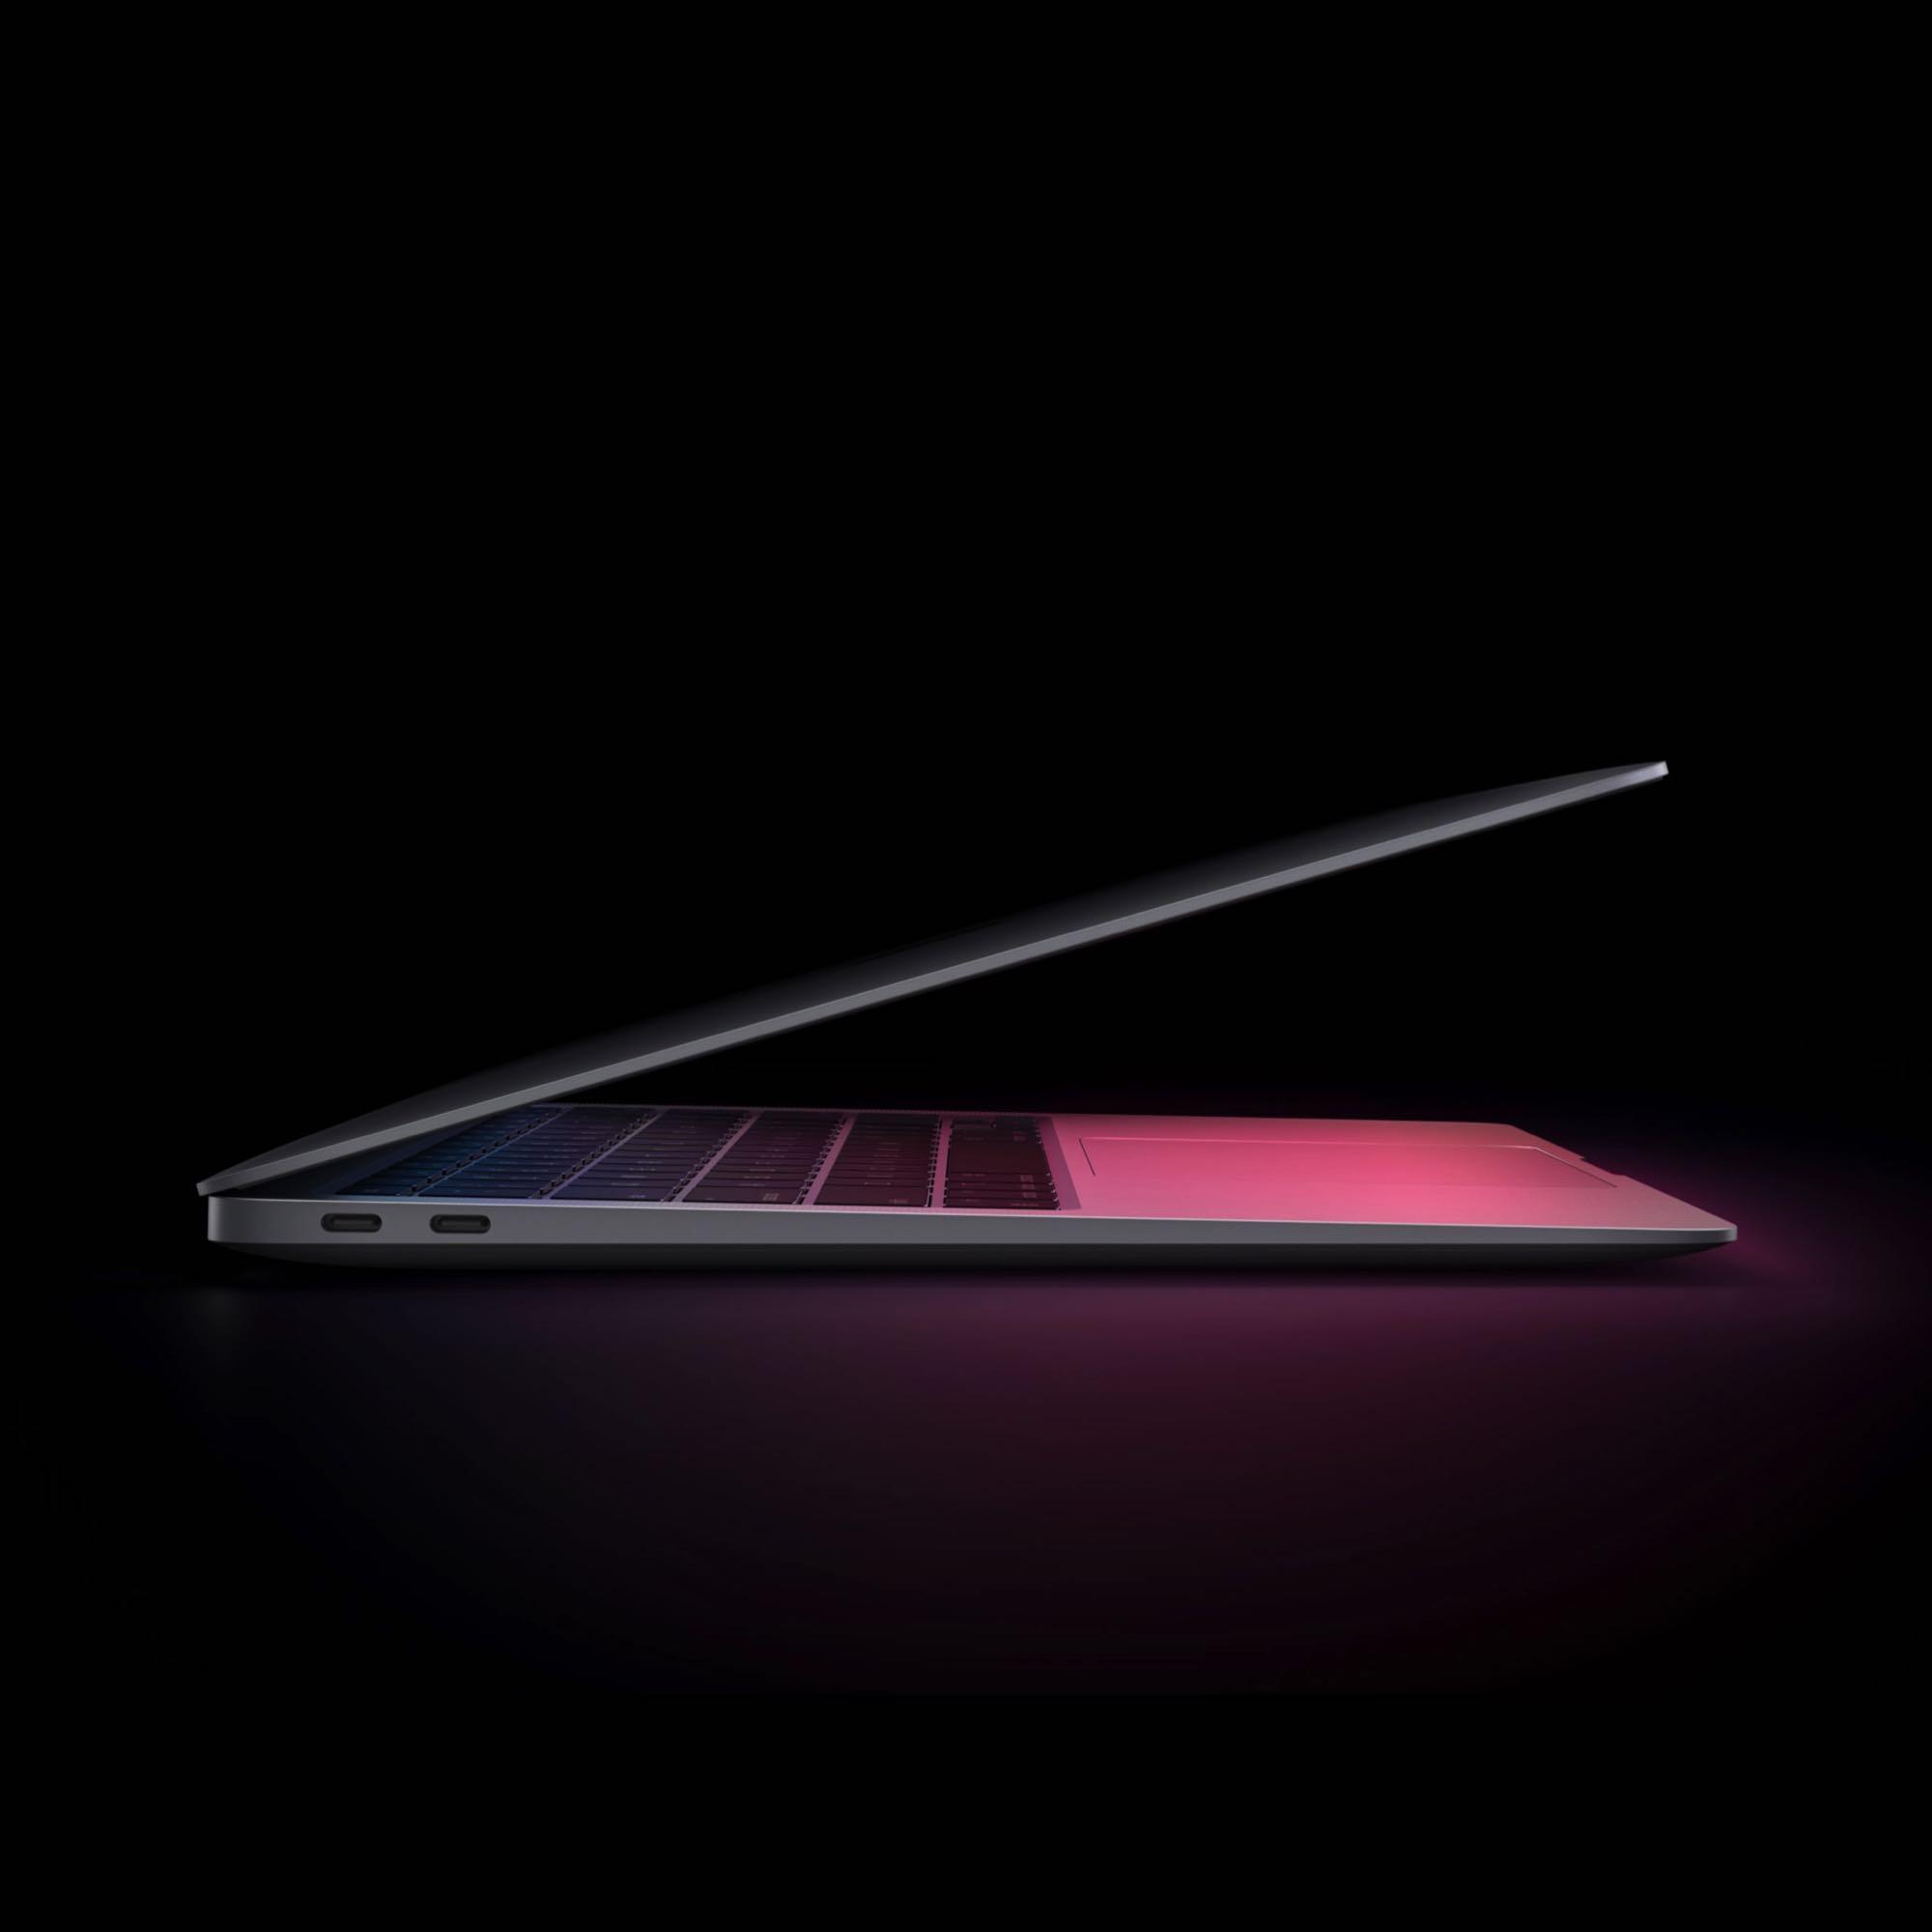 MacBook Air Ninove